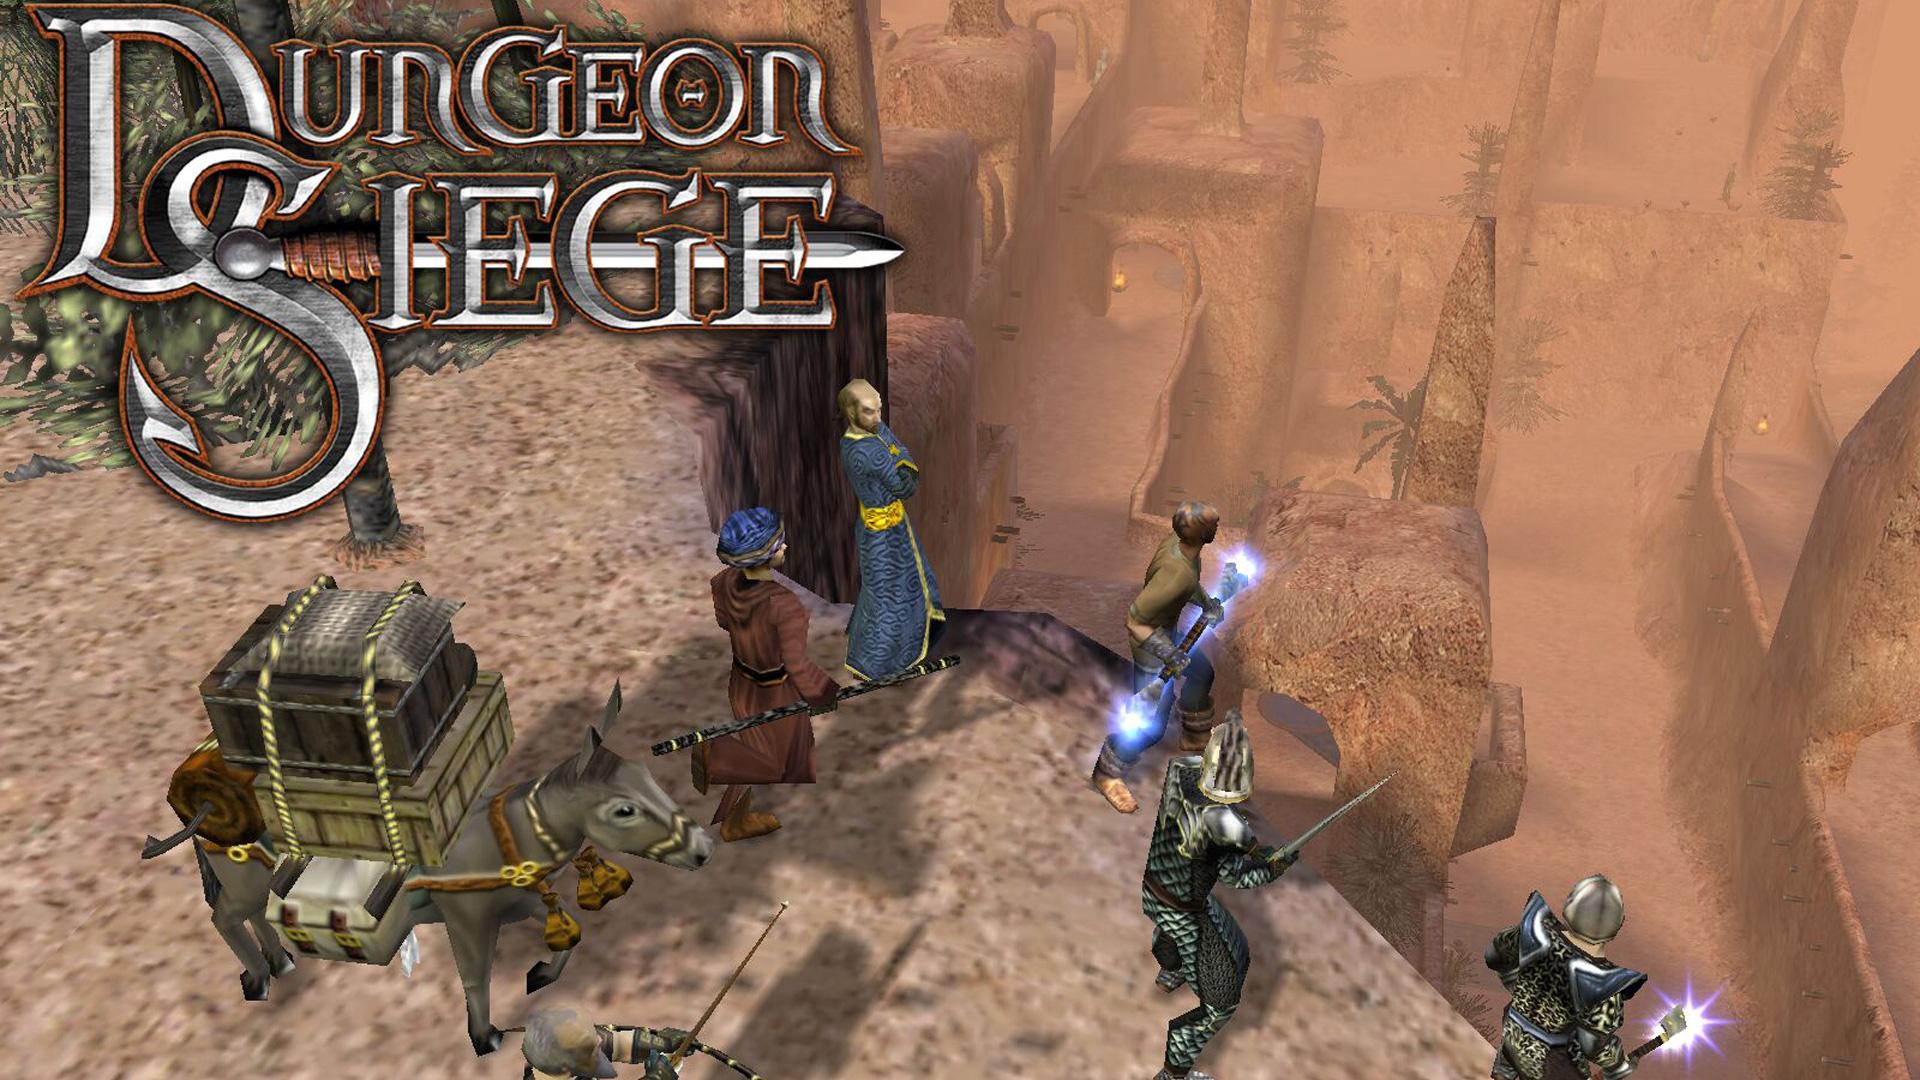 Free Dungeon Siege Wallpaper in 1920x1080